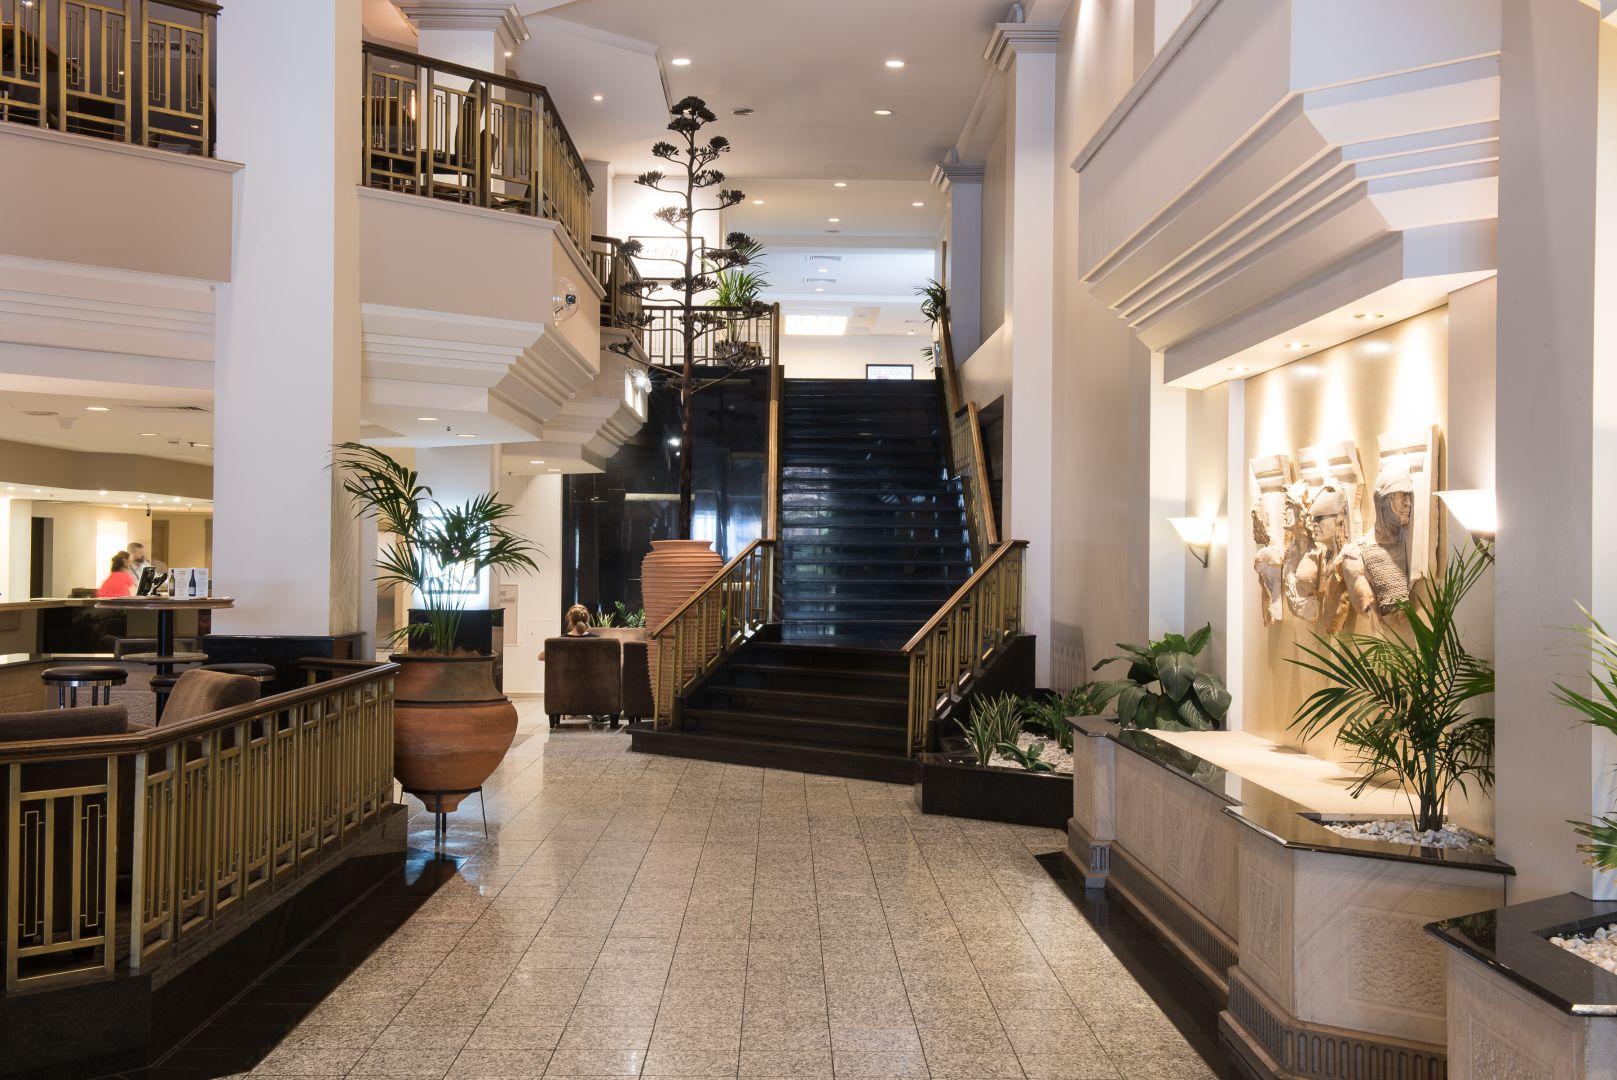 Hotel Grand Chancellor Adelaide: Providing the ...